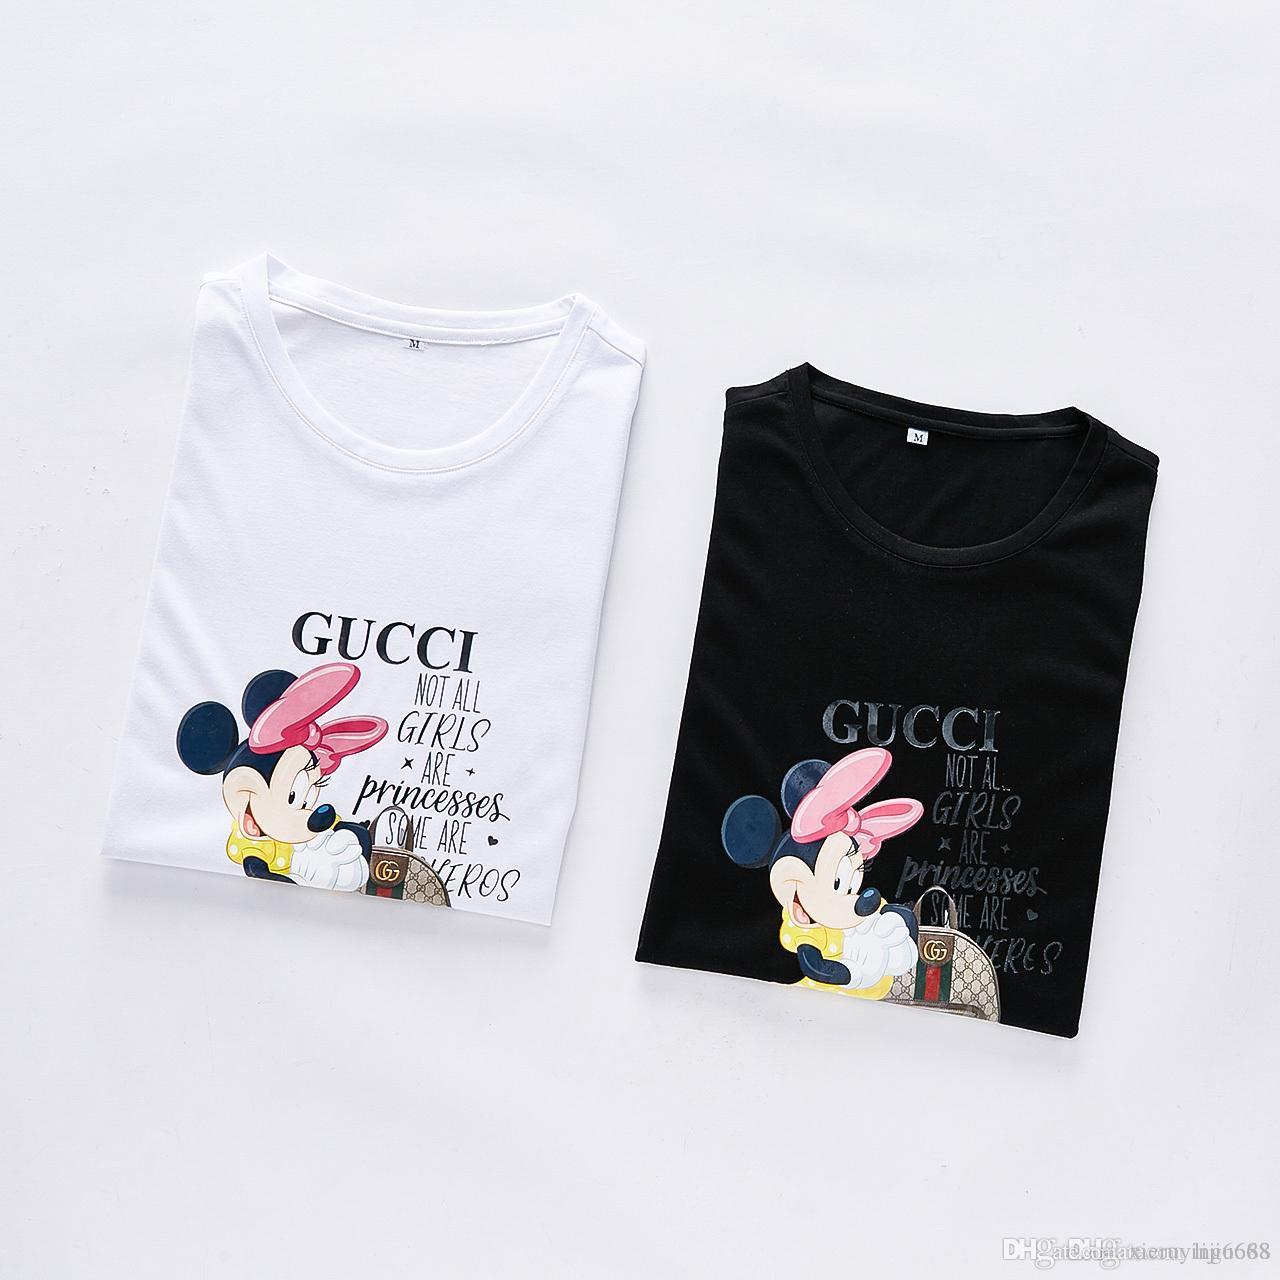 86441391c 2019 New Fashion Men T Shirt 3D Print Hip Hop Personality Anime Pattern  Casual Men'S T Shirt Clothing Summer Cotton Short Sleeve T Shir Tee Shirt  For Sale ...